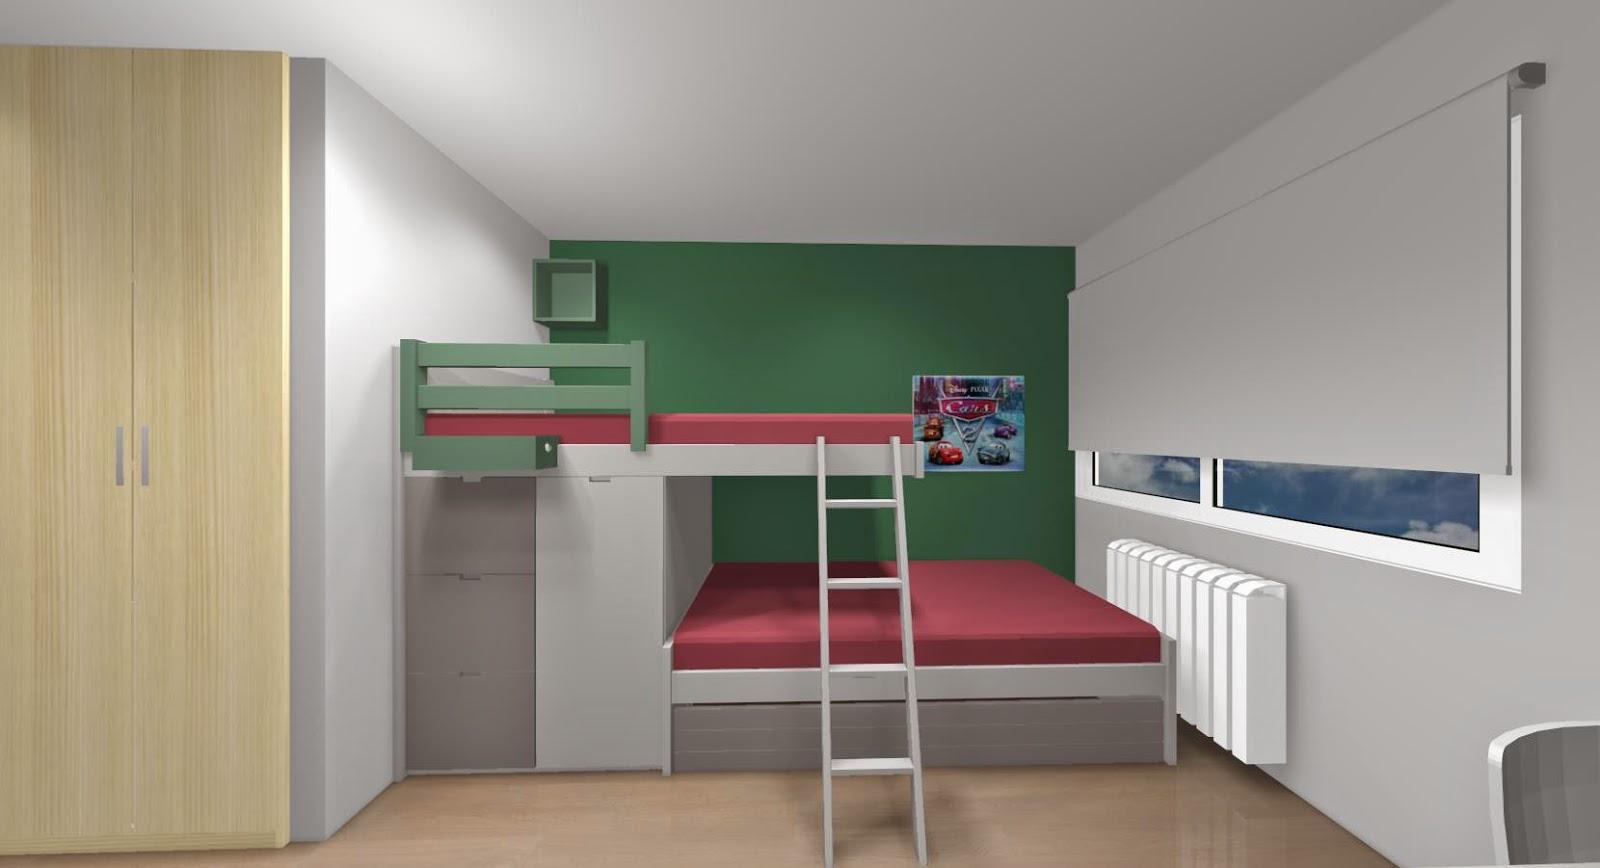 5 premisas para amueblar los dormitorios juveniles for Camas juveniles modernas